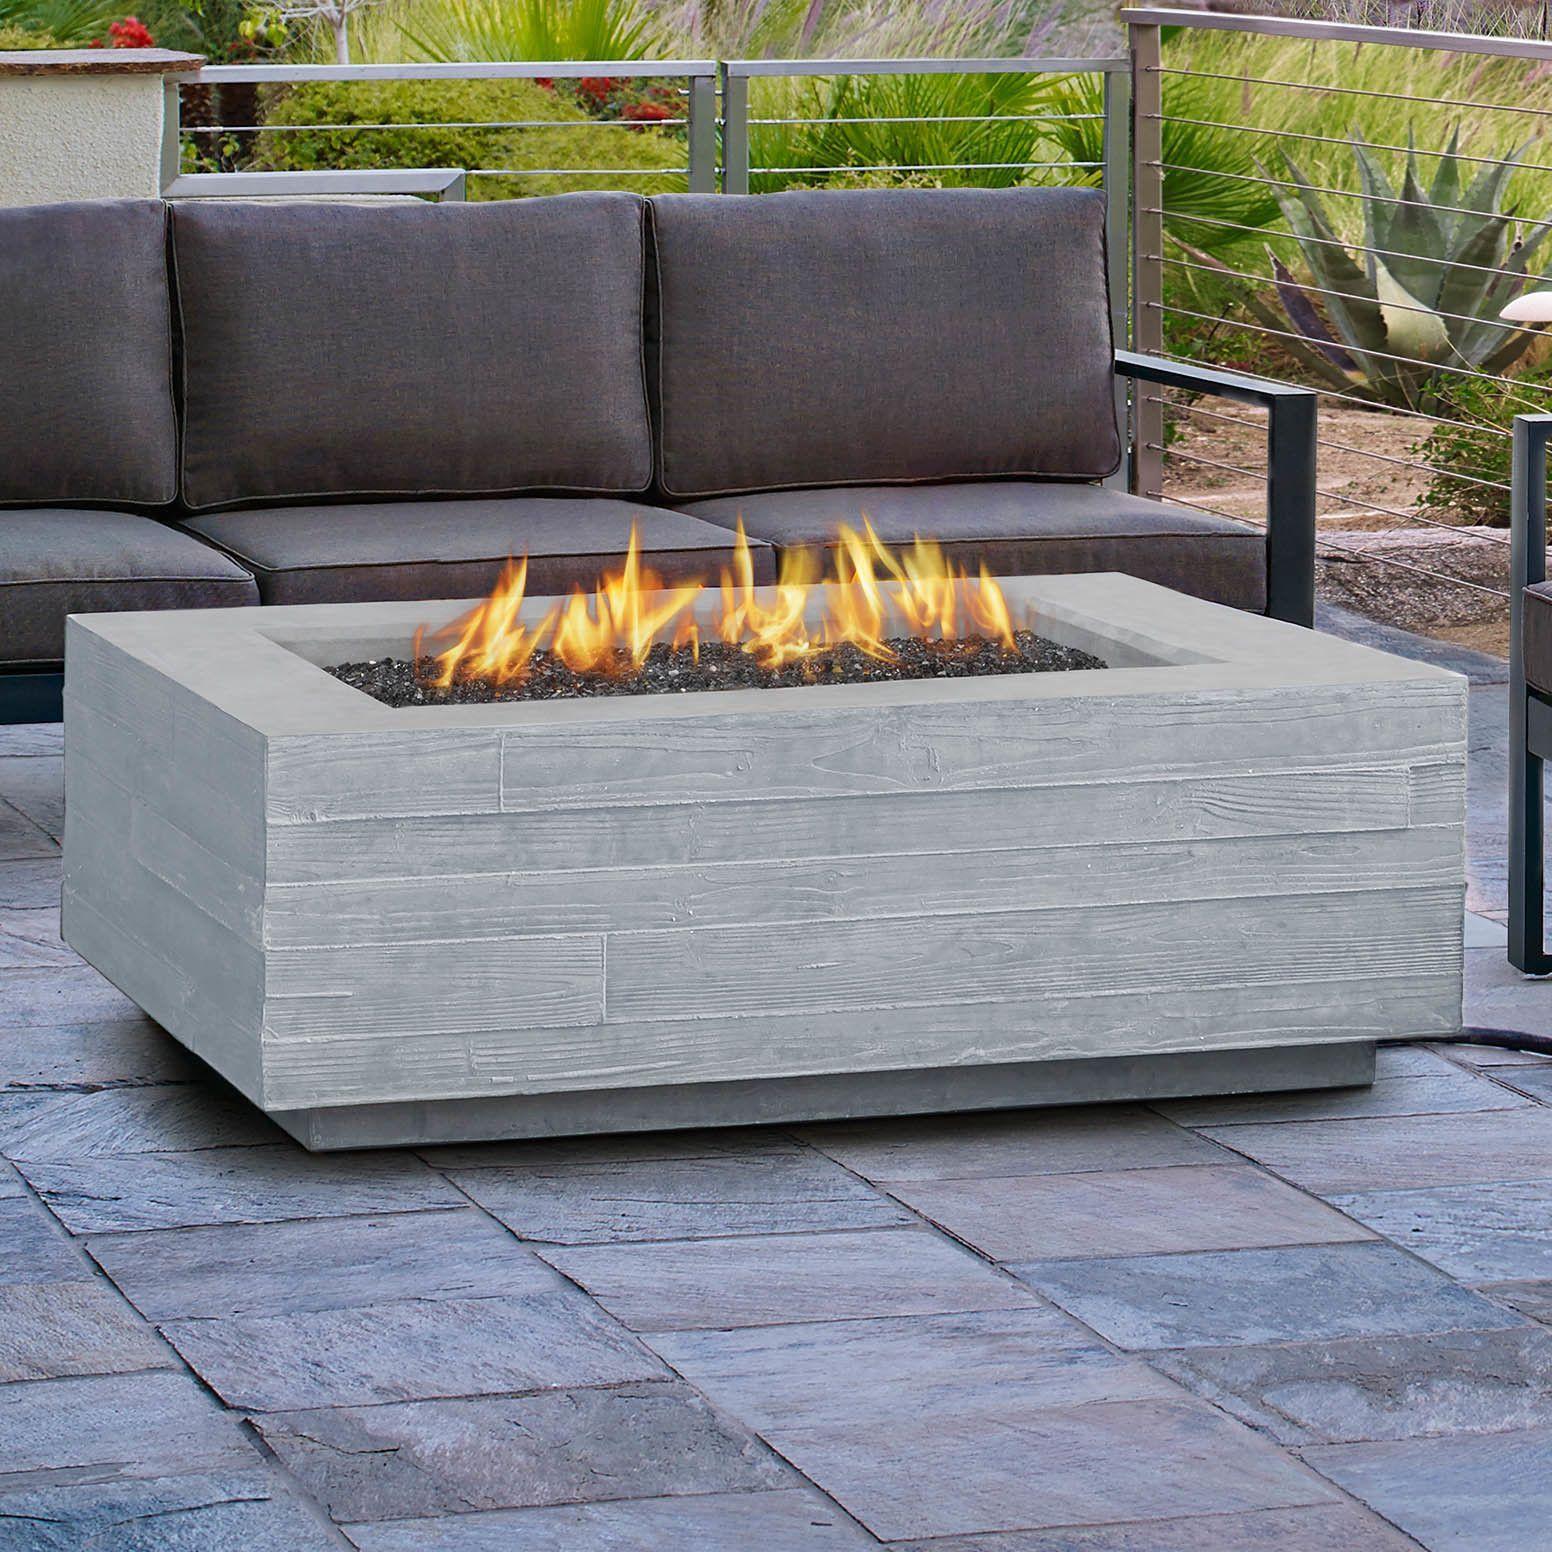 Board form propane outdoor fireplace backyard pinterest fire